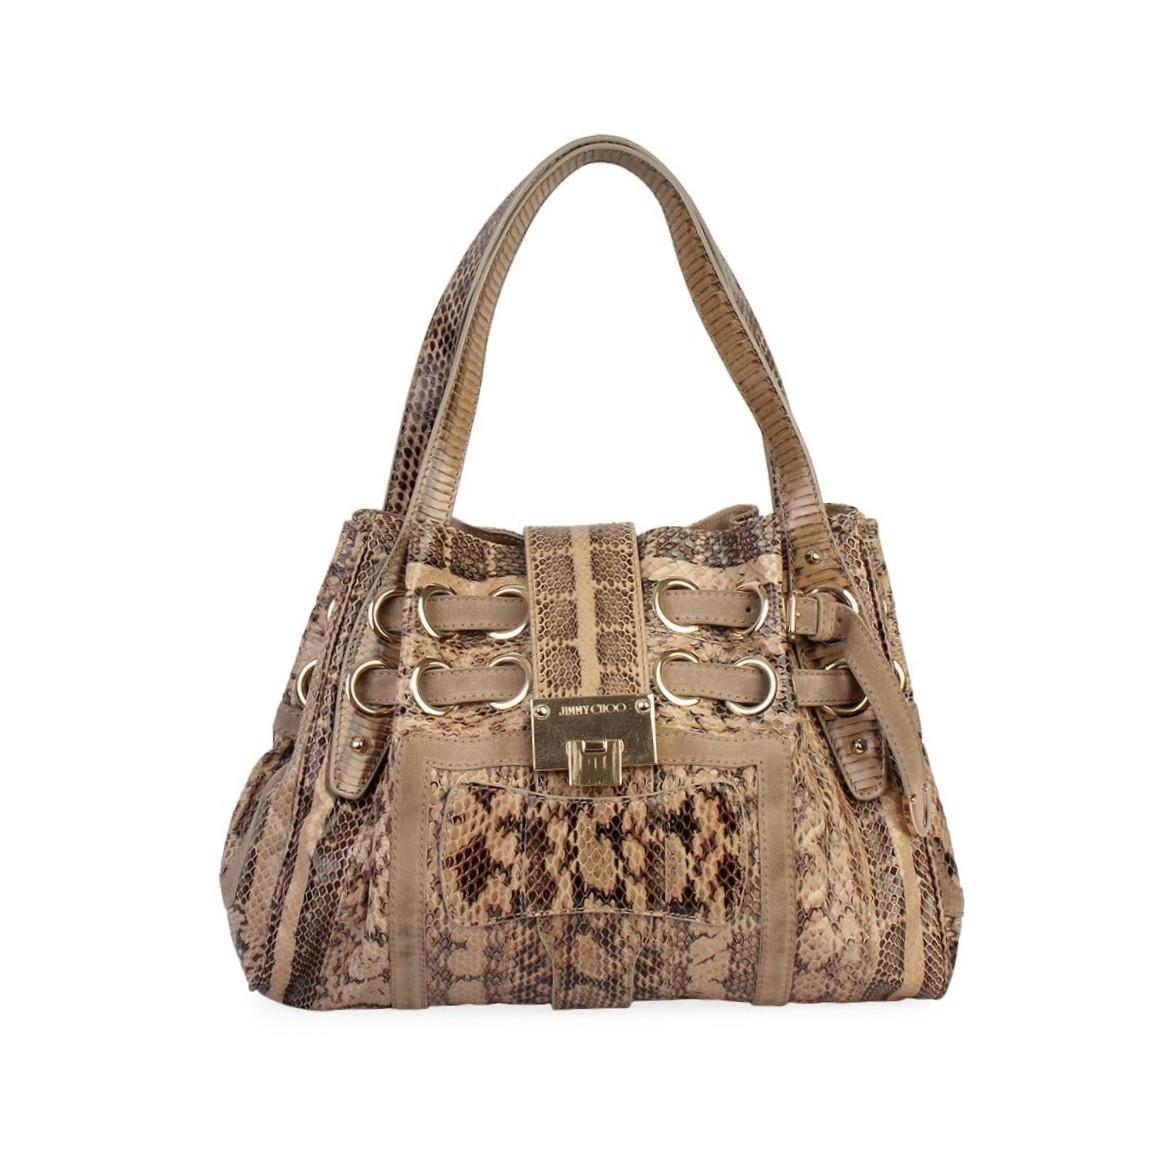 a73956426338 JIMMY CHOO Snakeskin Medium Riki Bag